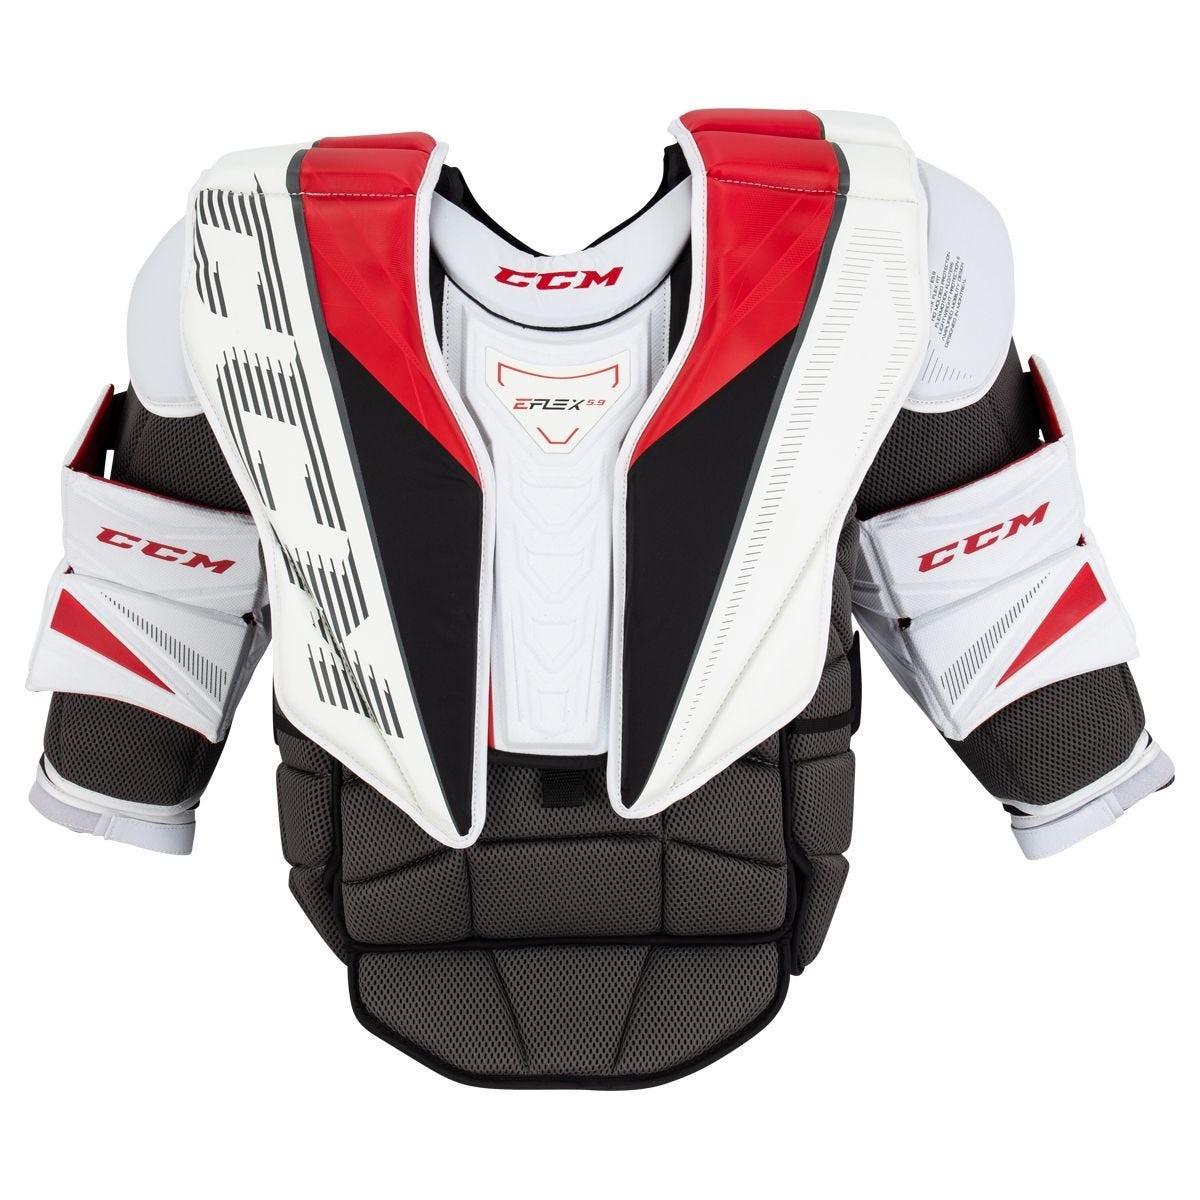 CCM Extreme Flex E5.9 Intermediate Goalie Chest & Arm Protector